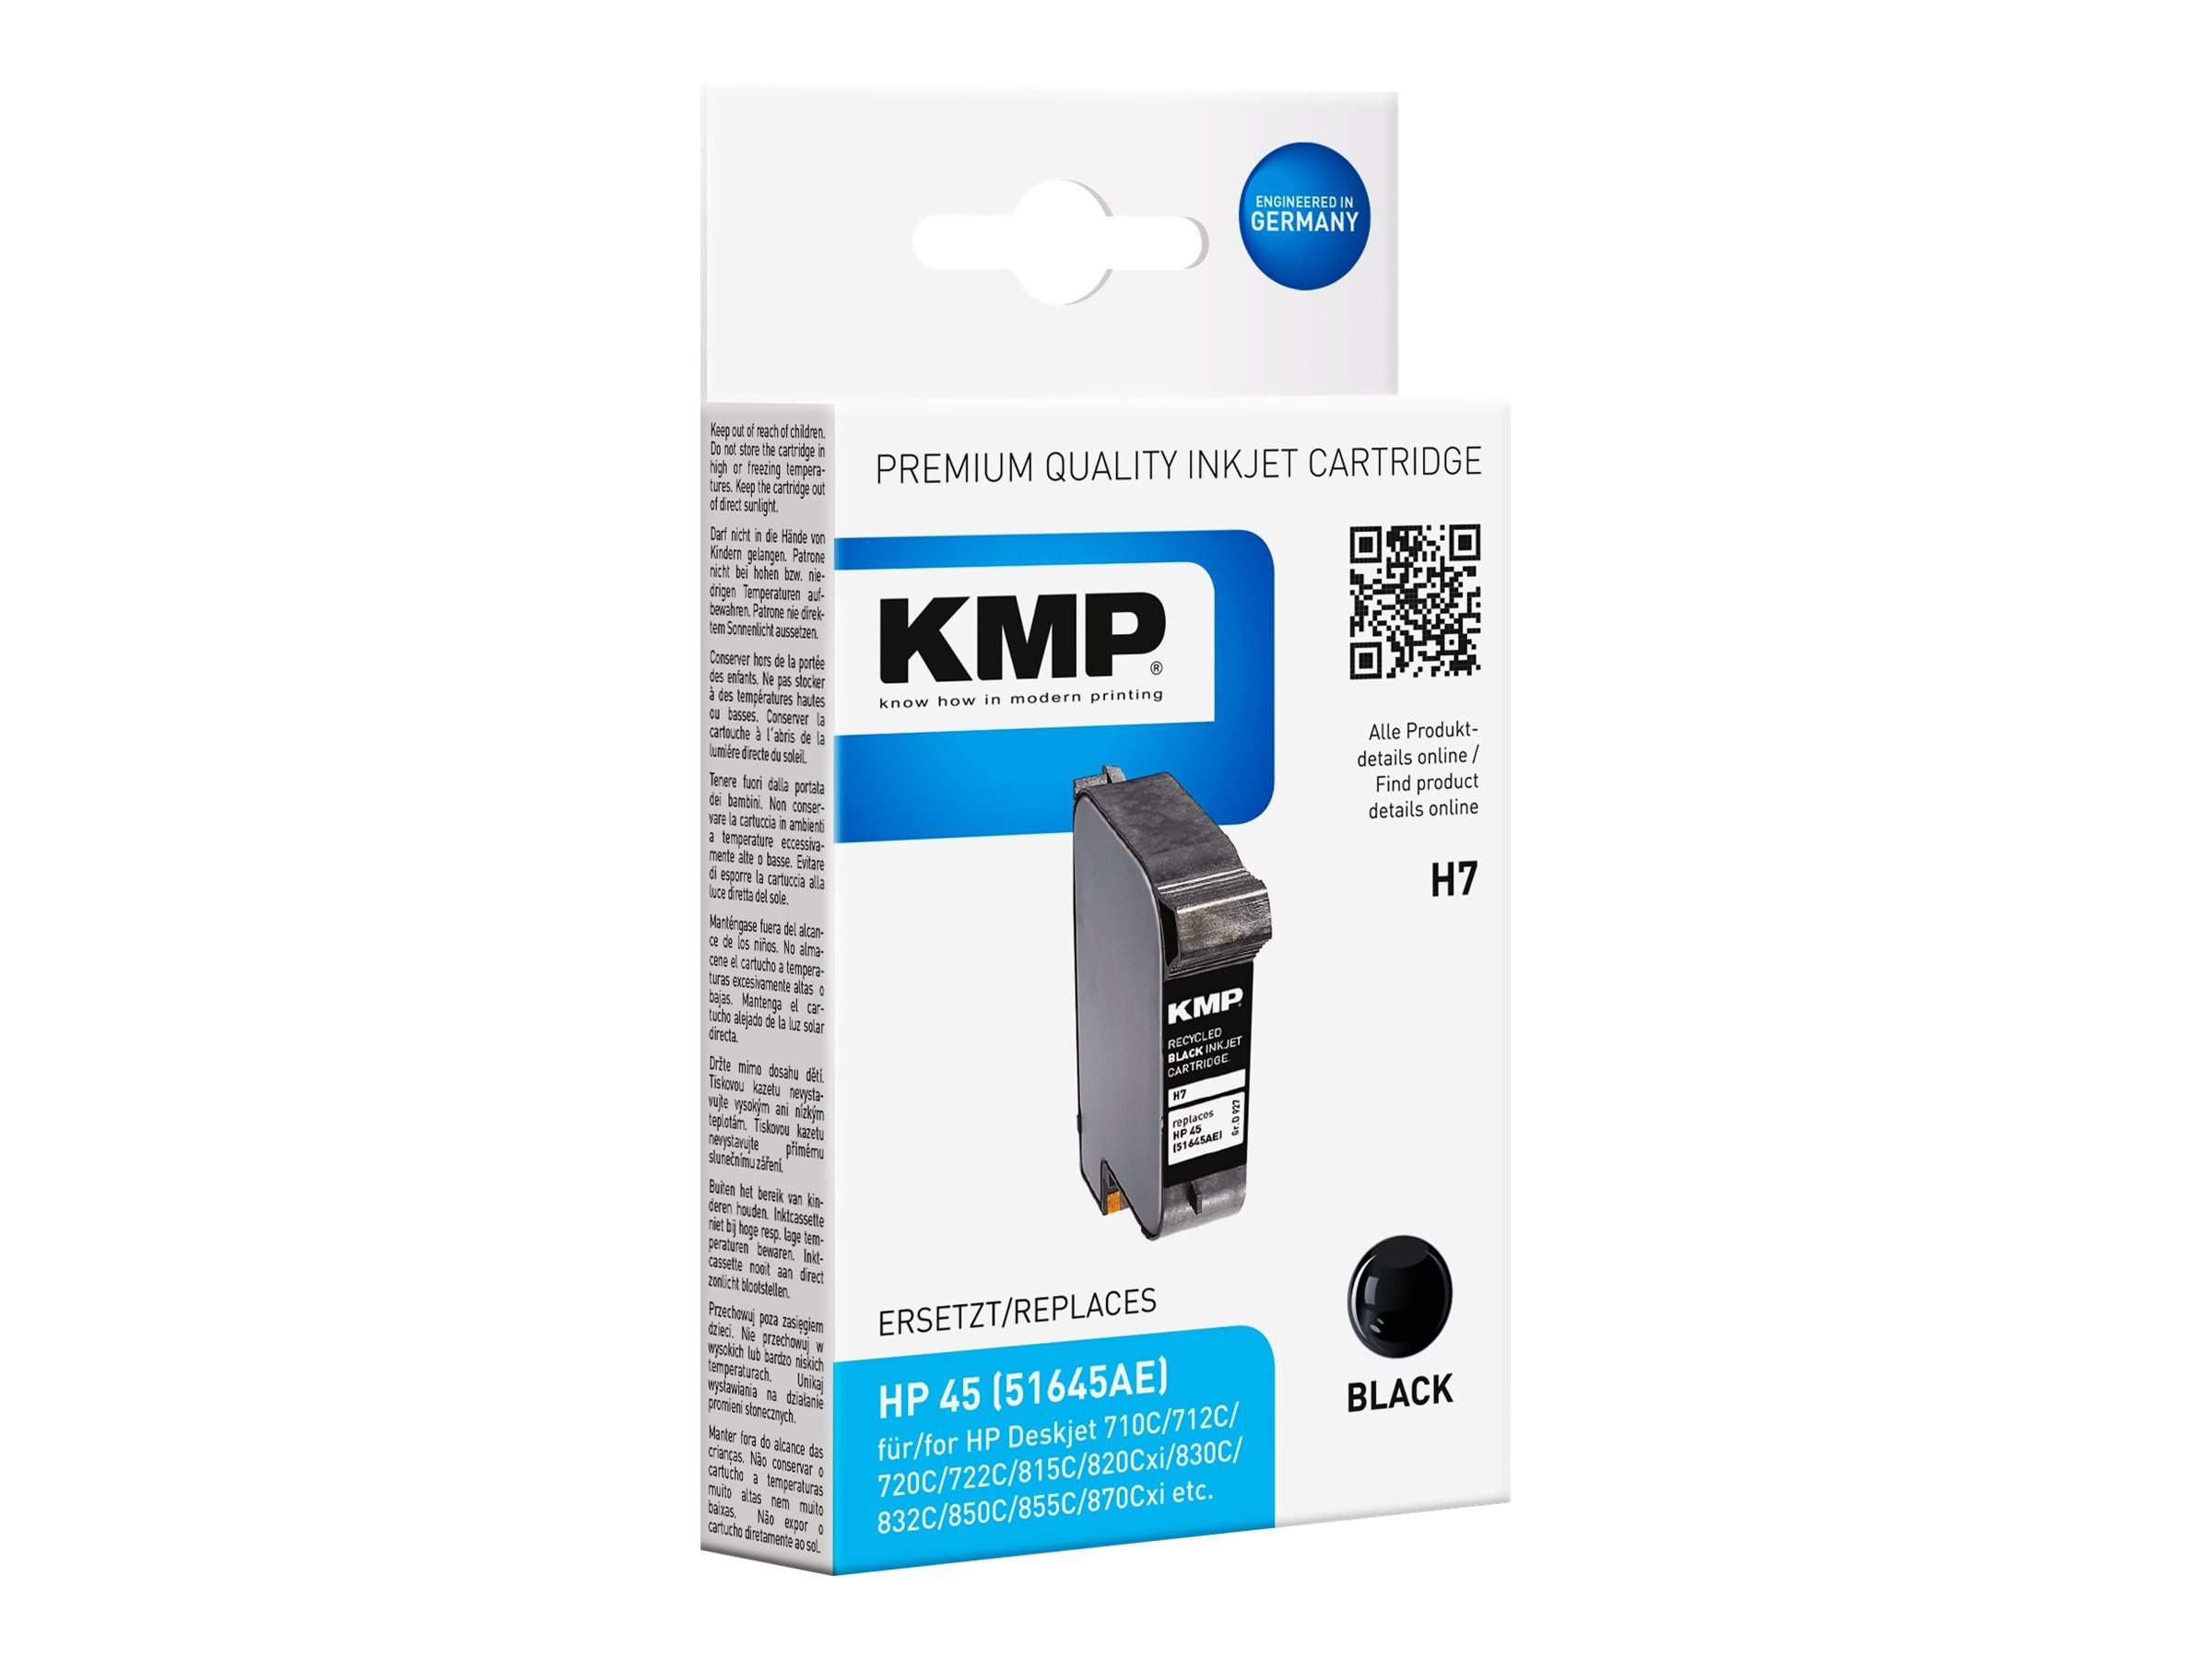 KMP H7 - 42 ml - Schwarz - compatible - Tintenpatrone